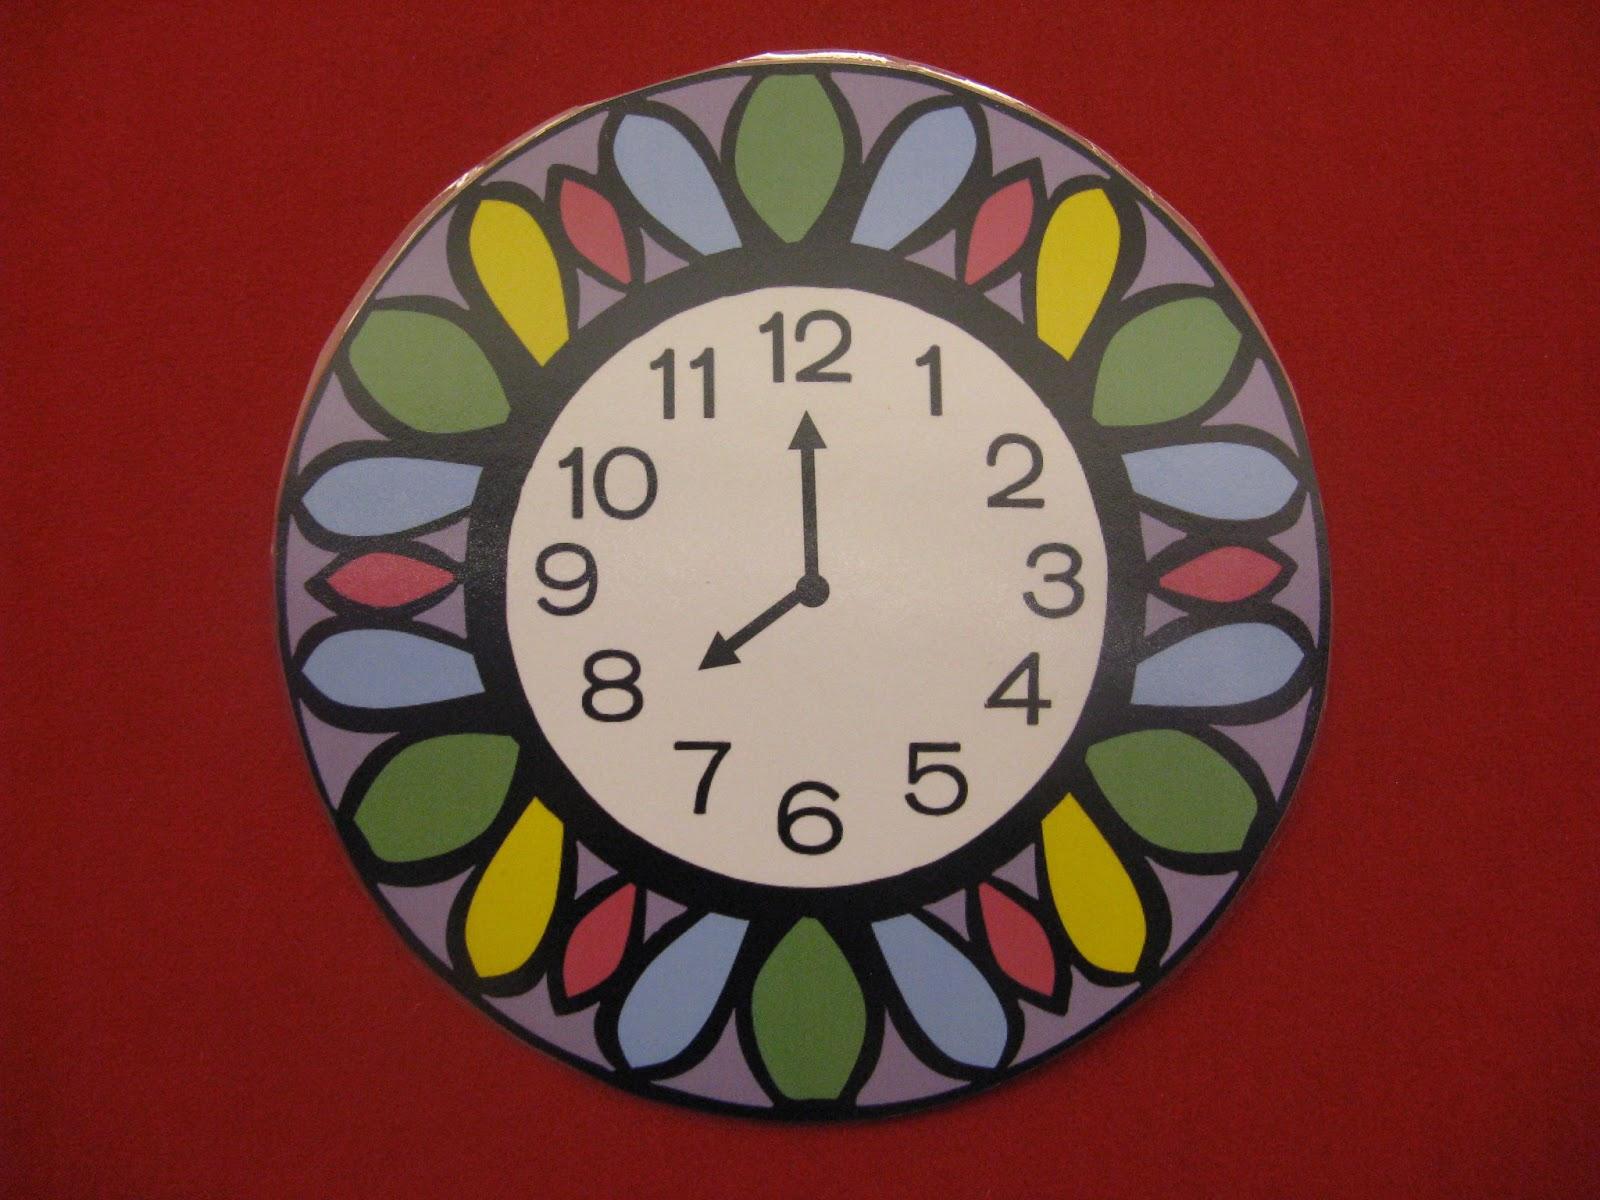 clipart 8 o'clock - photo #28